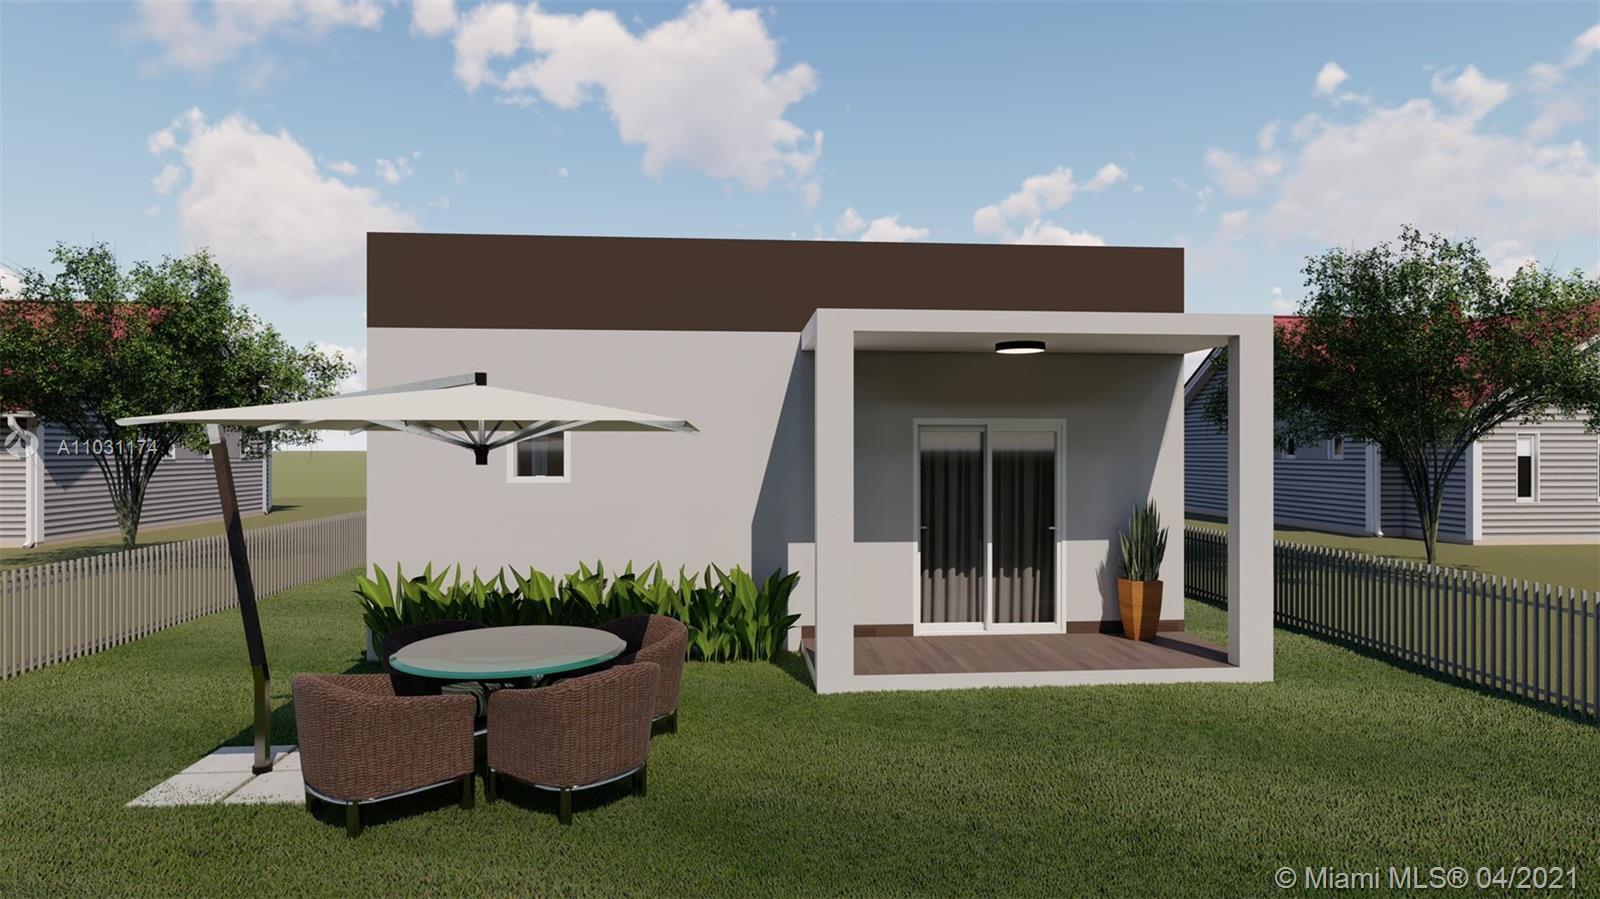 NEW CONSTRUCTION! Beautiful 4 bedroom 3 bath home. (2 bedroom ensuite) 1963 sq ft under AC. Top of t